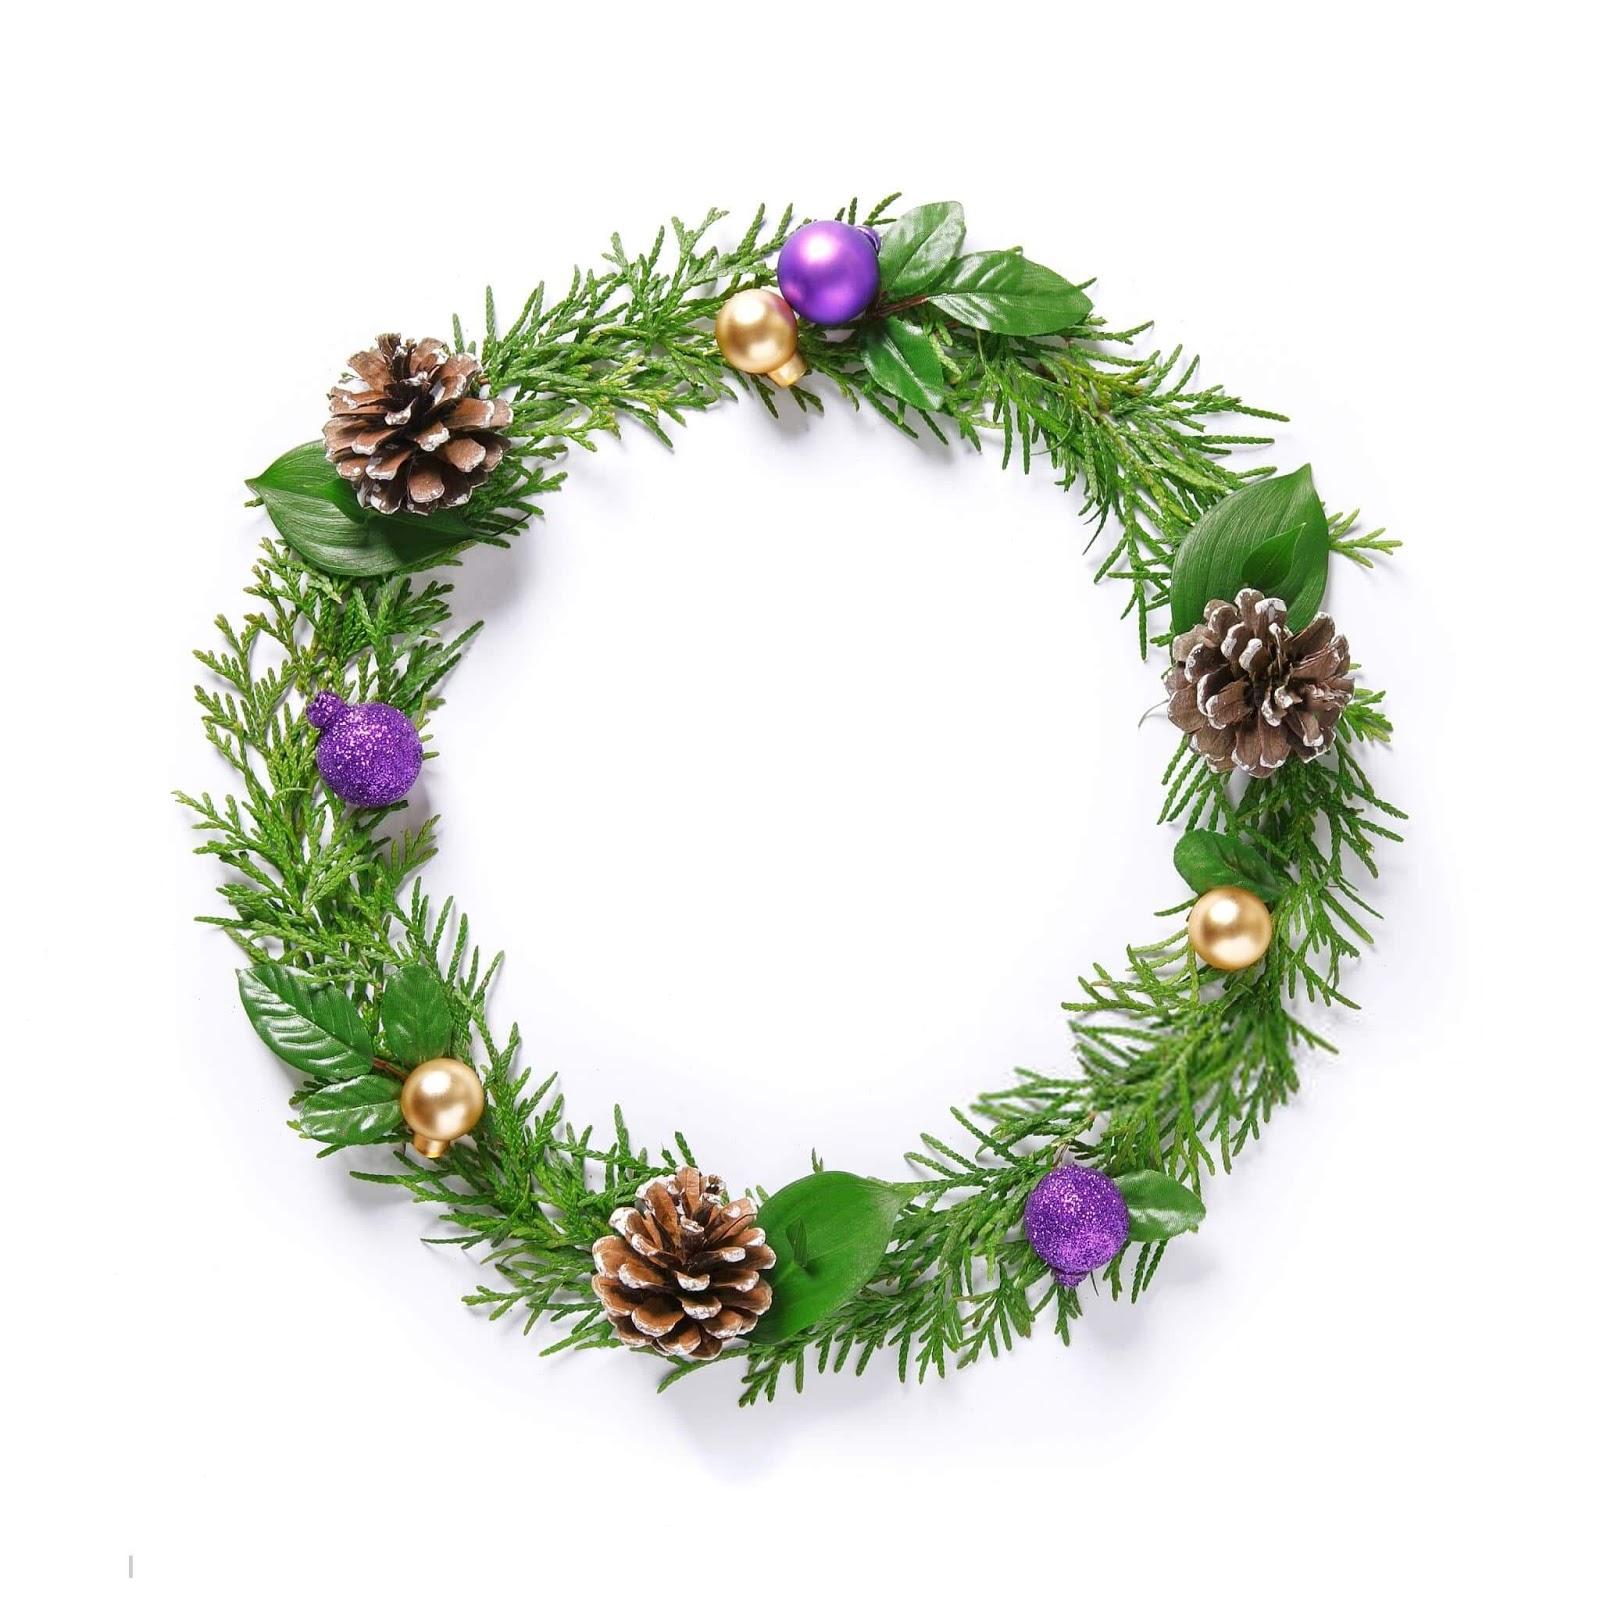 Pictures of Wreaths On Doors